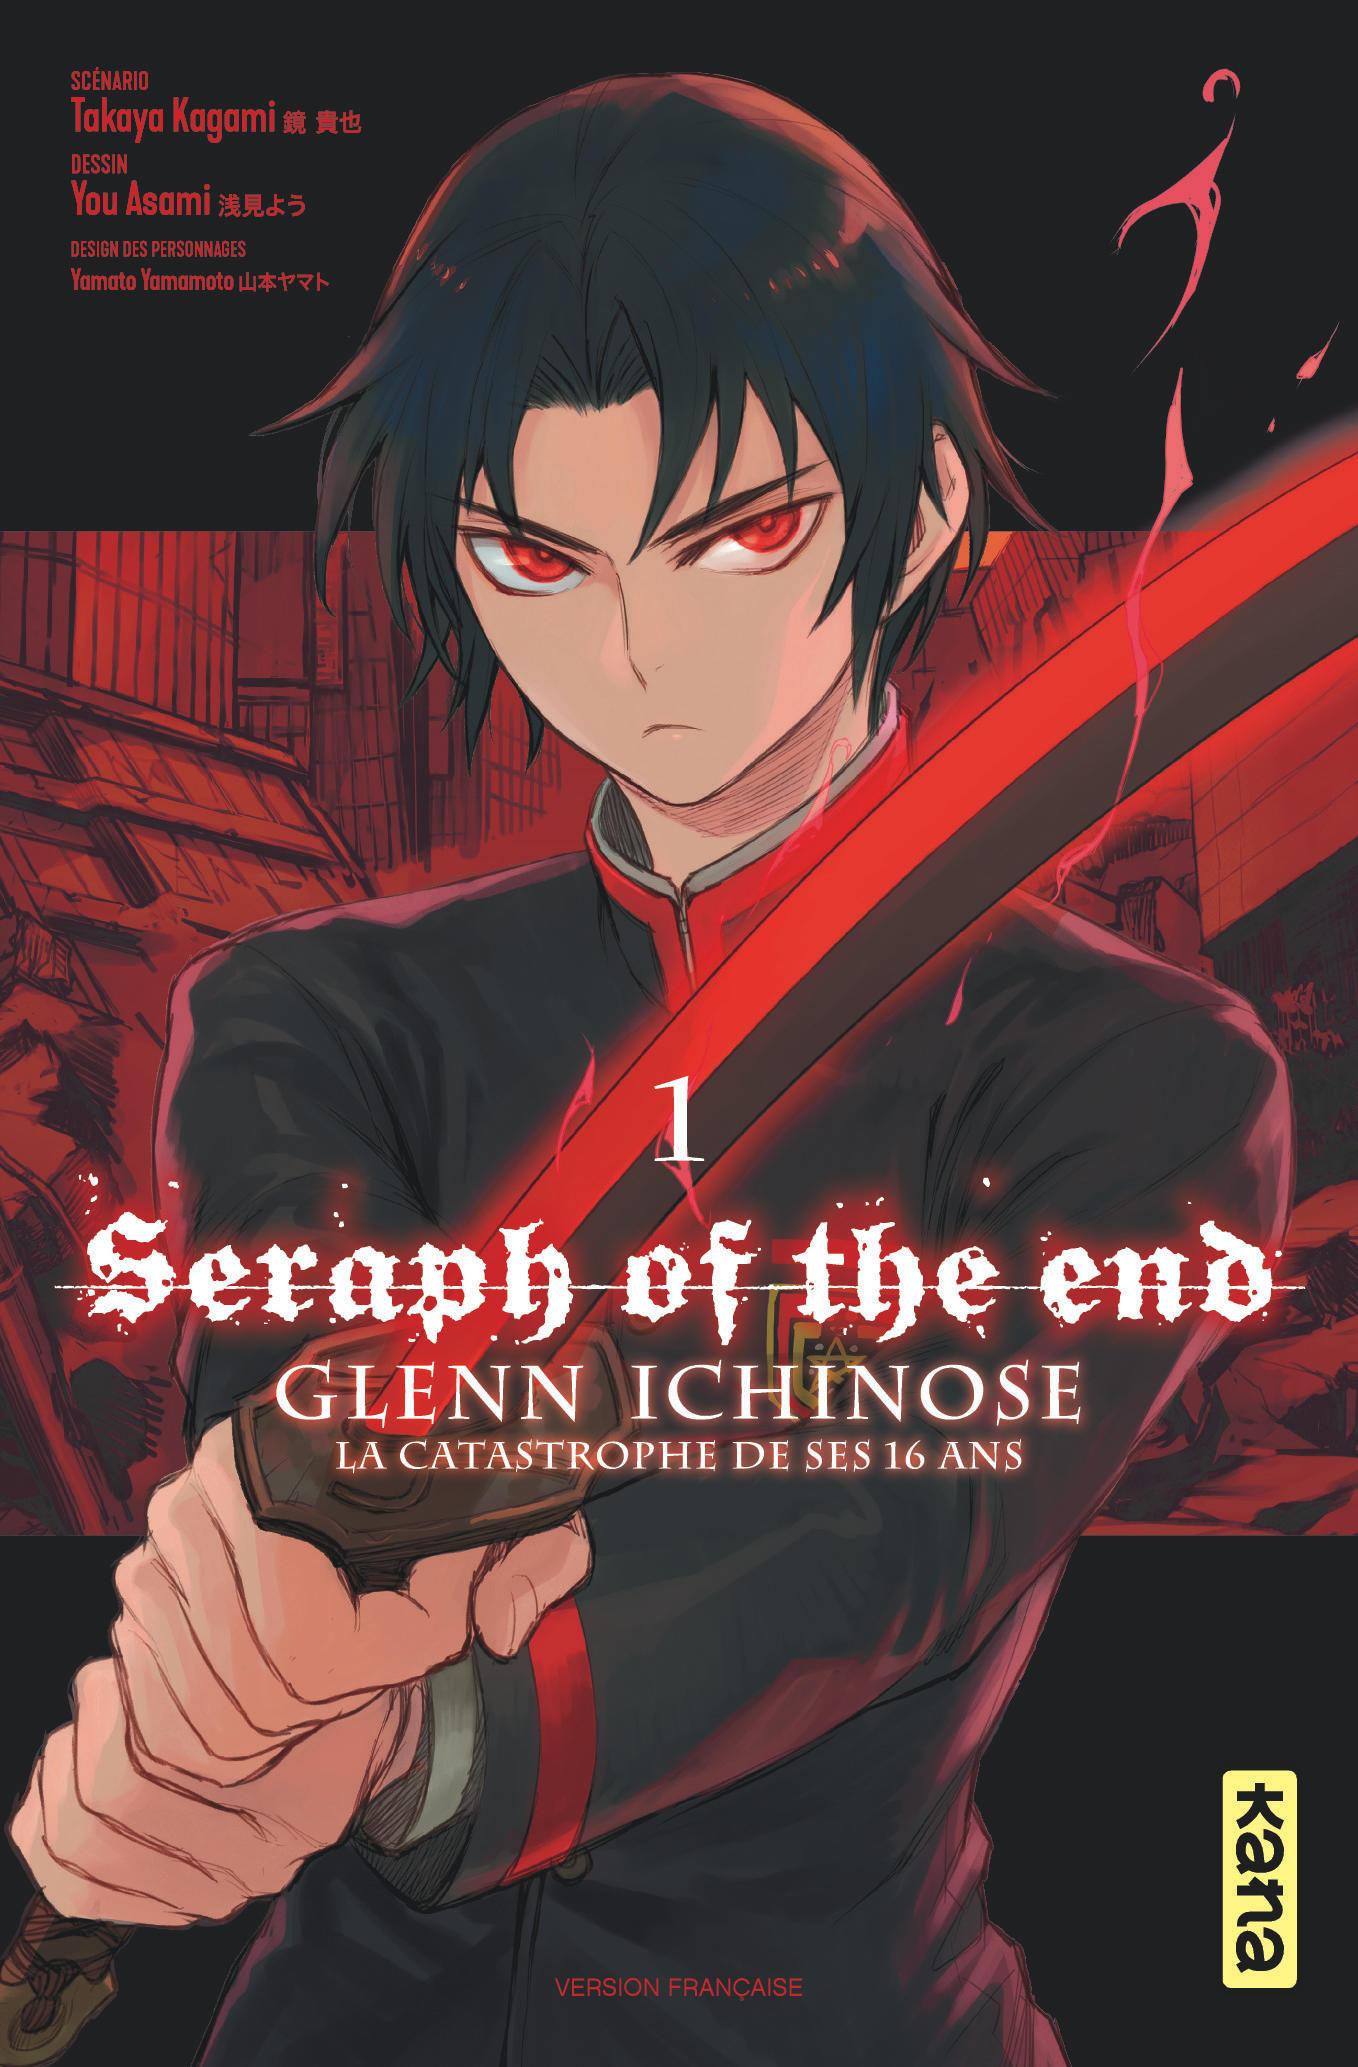 Seraph of the End - Glenn Ichinose 1